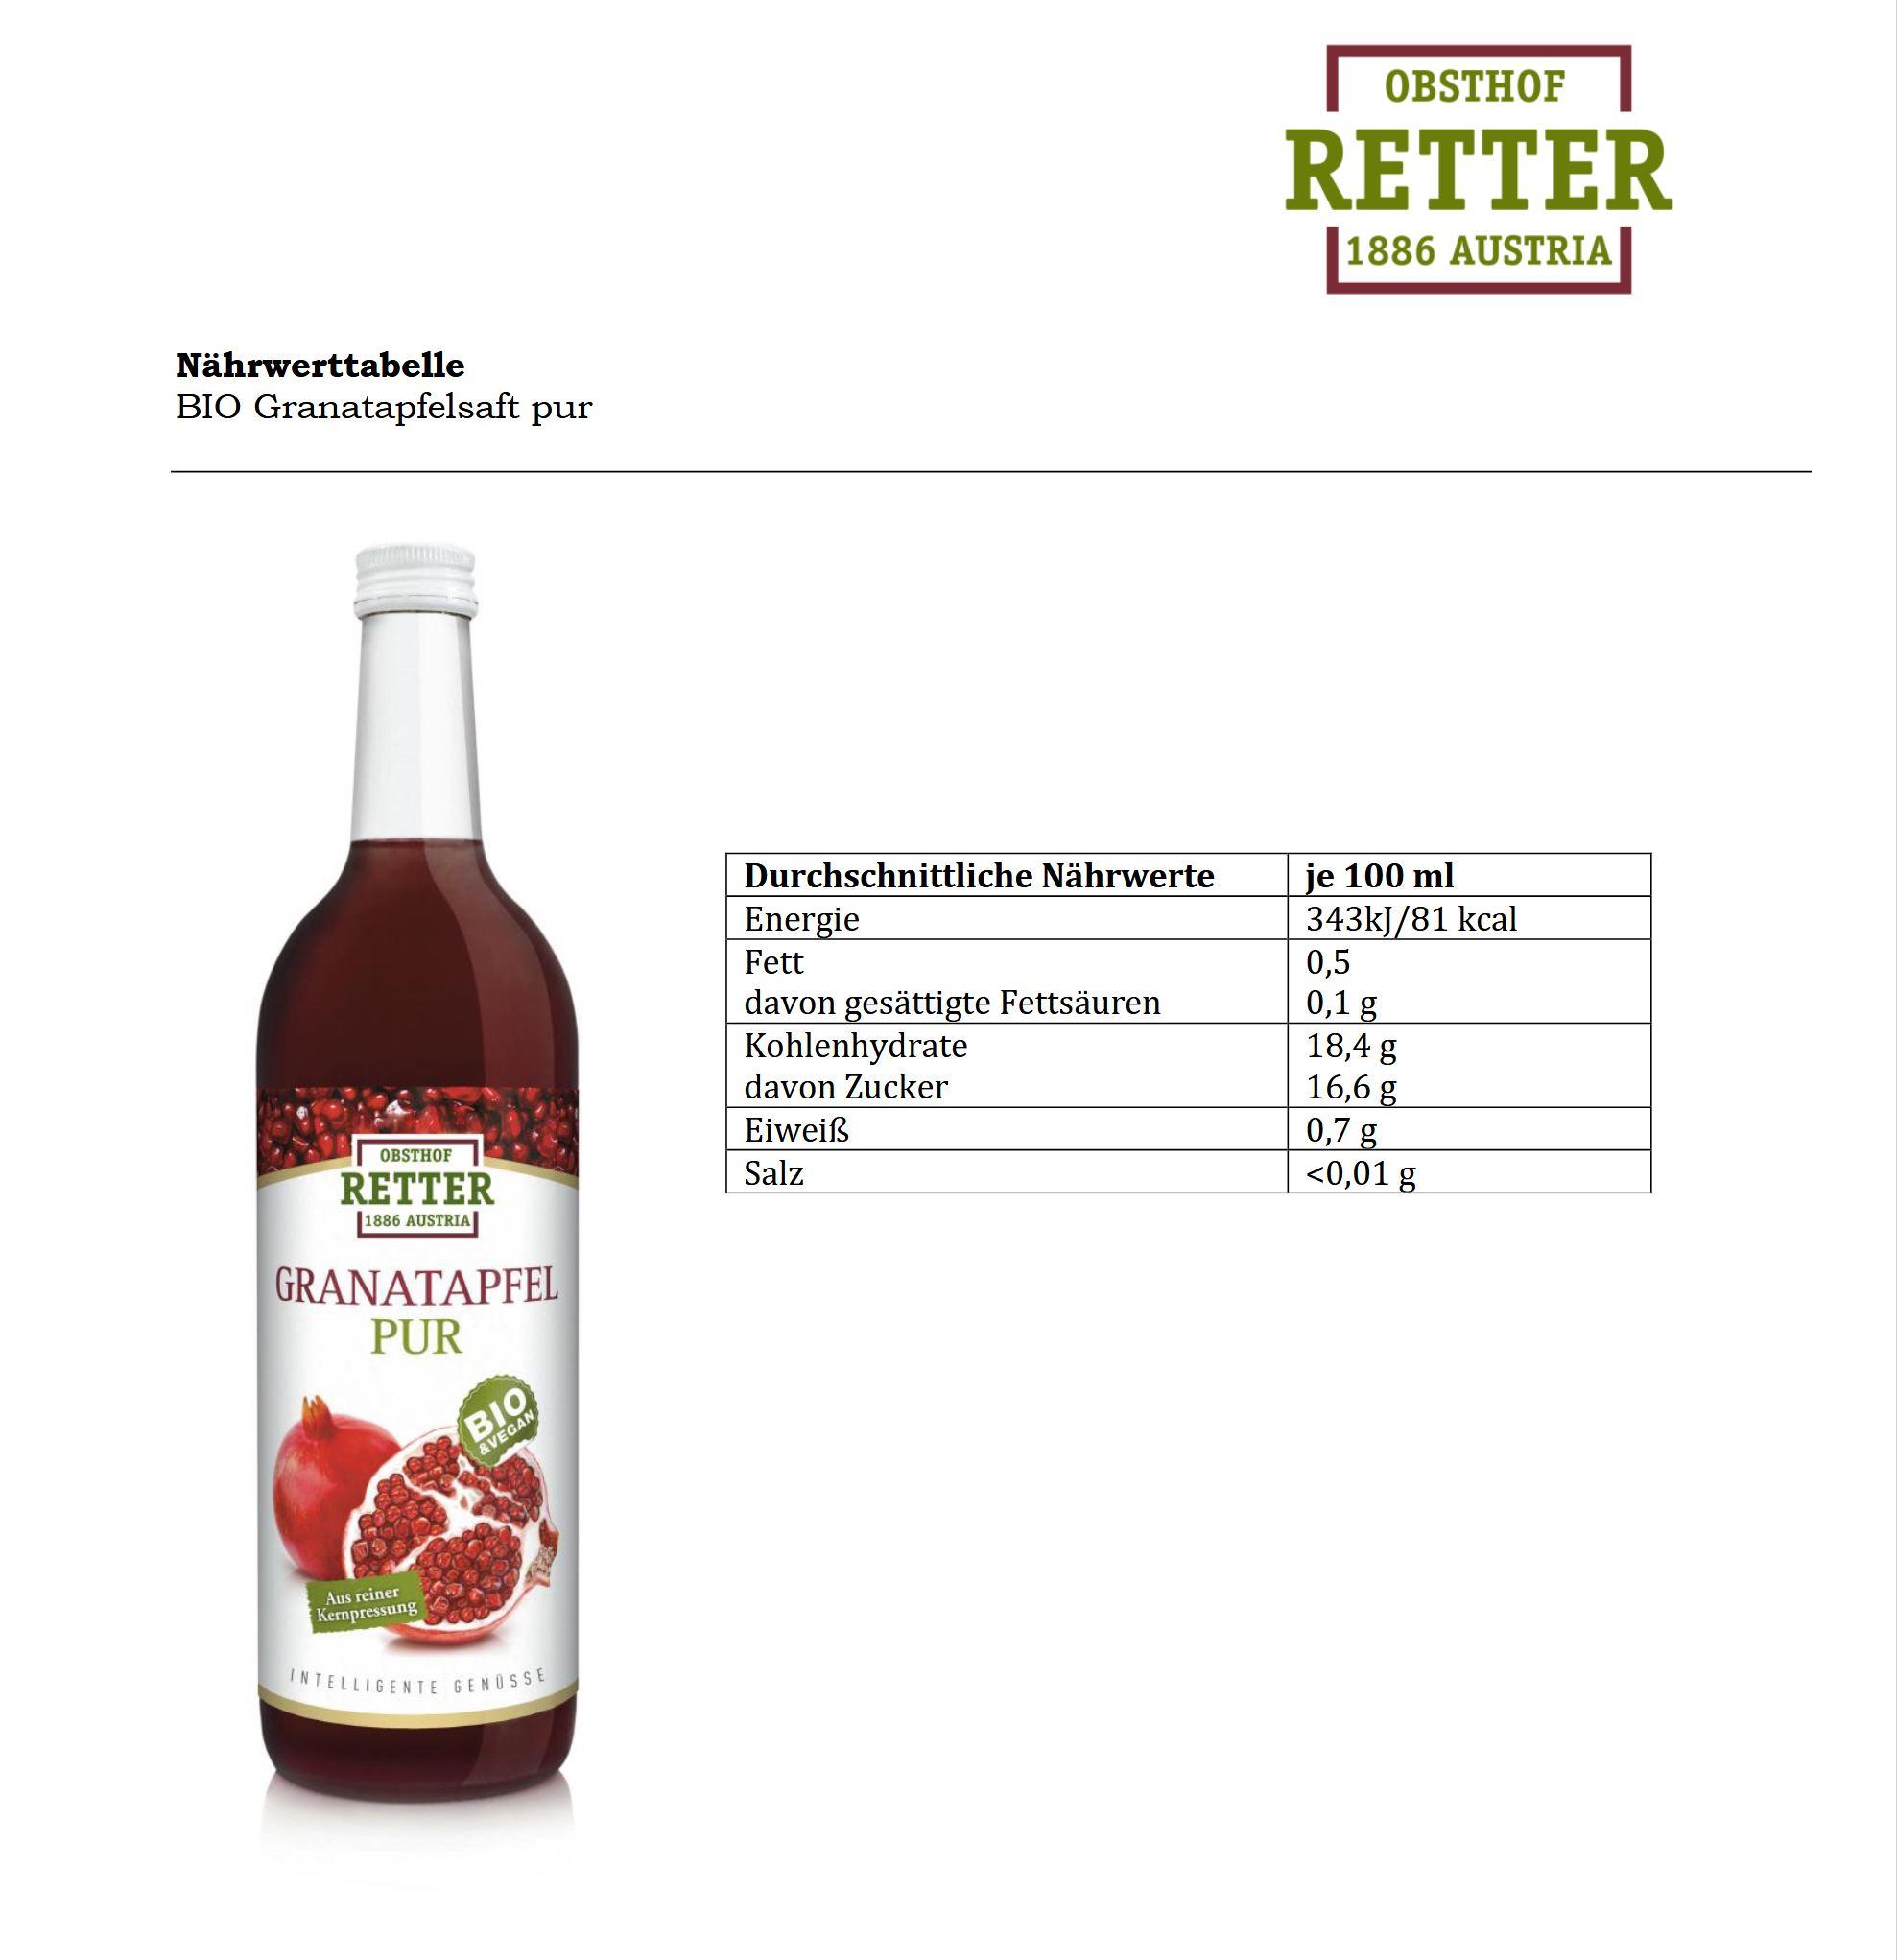 BIO Granatapfel pur, 100% Direktsaft